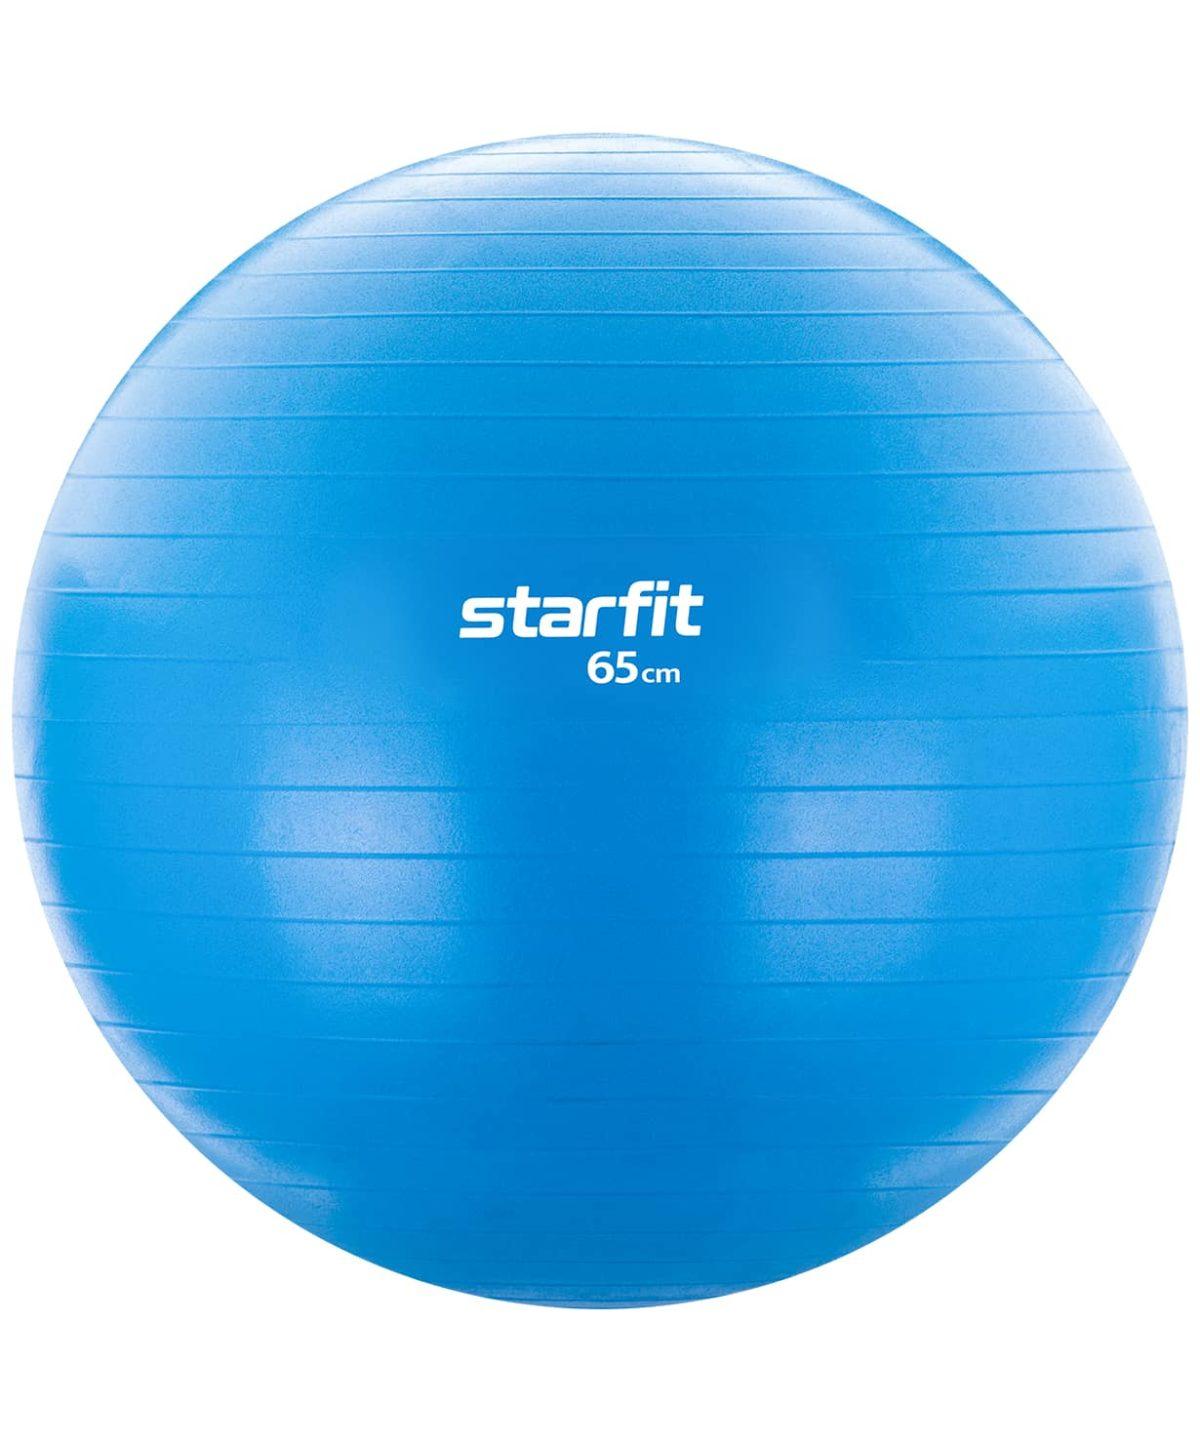 STARFIT Фитбол антивзрыв 65см.1000гр. без насоса GB-104: голубой - 1